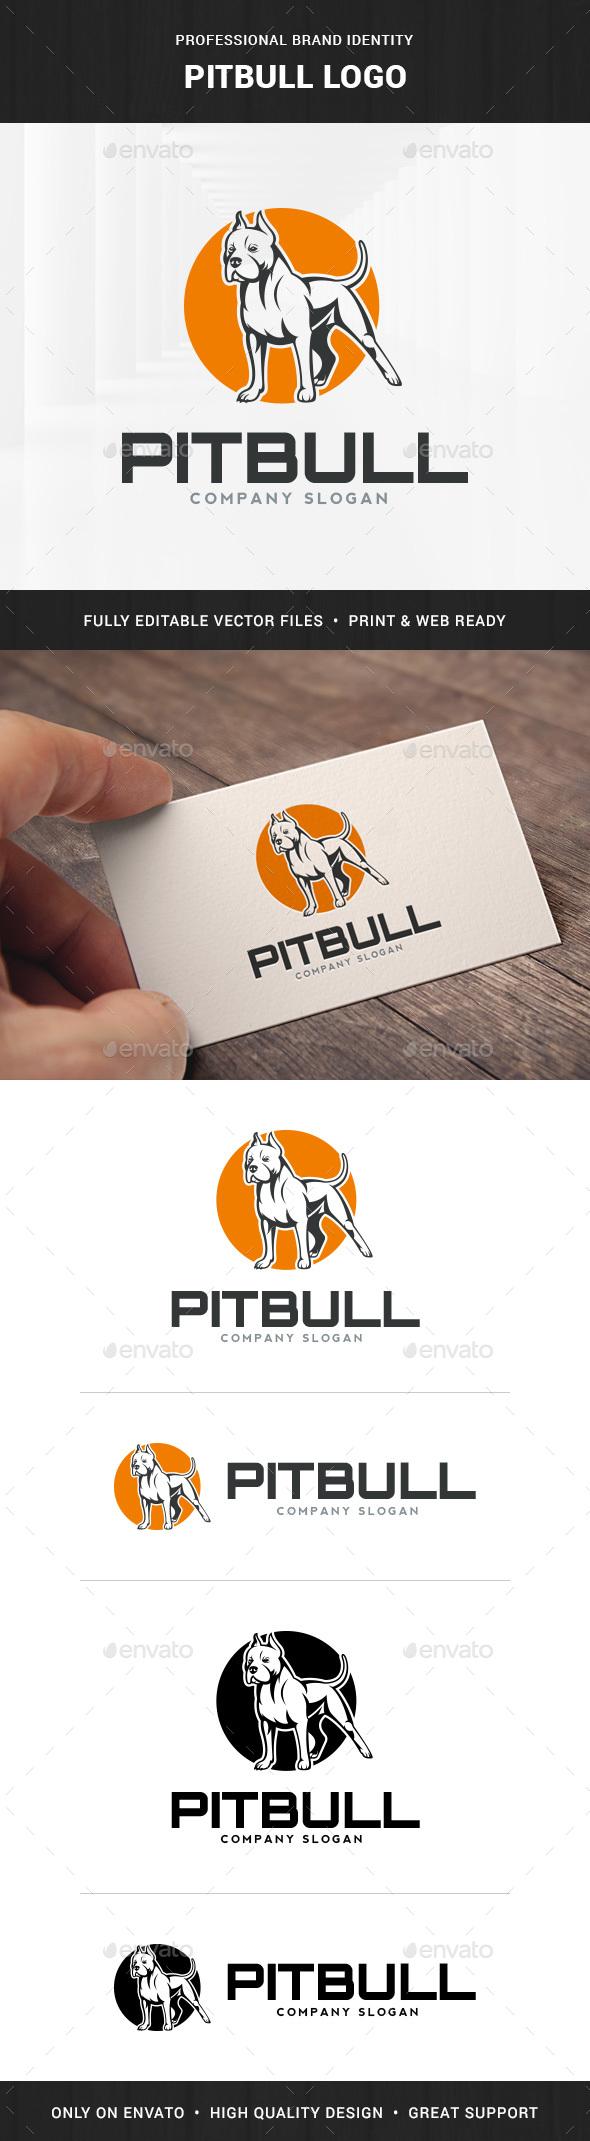 Pitbull Logo Template